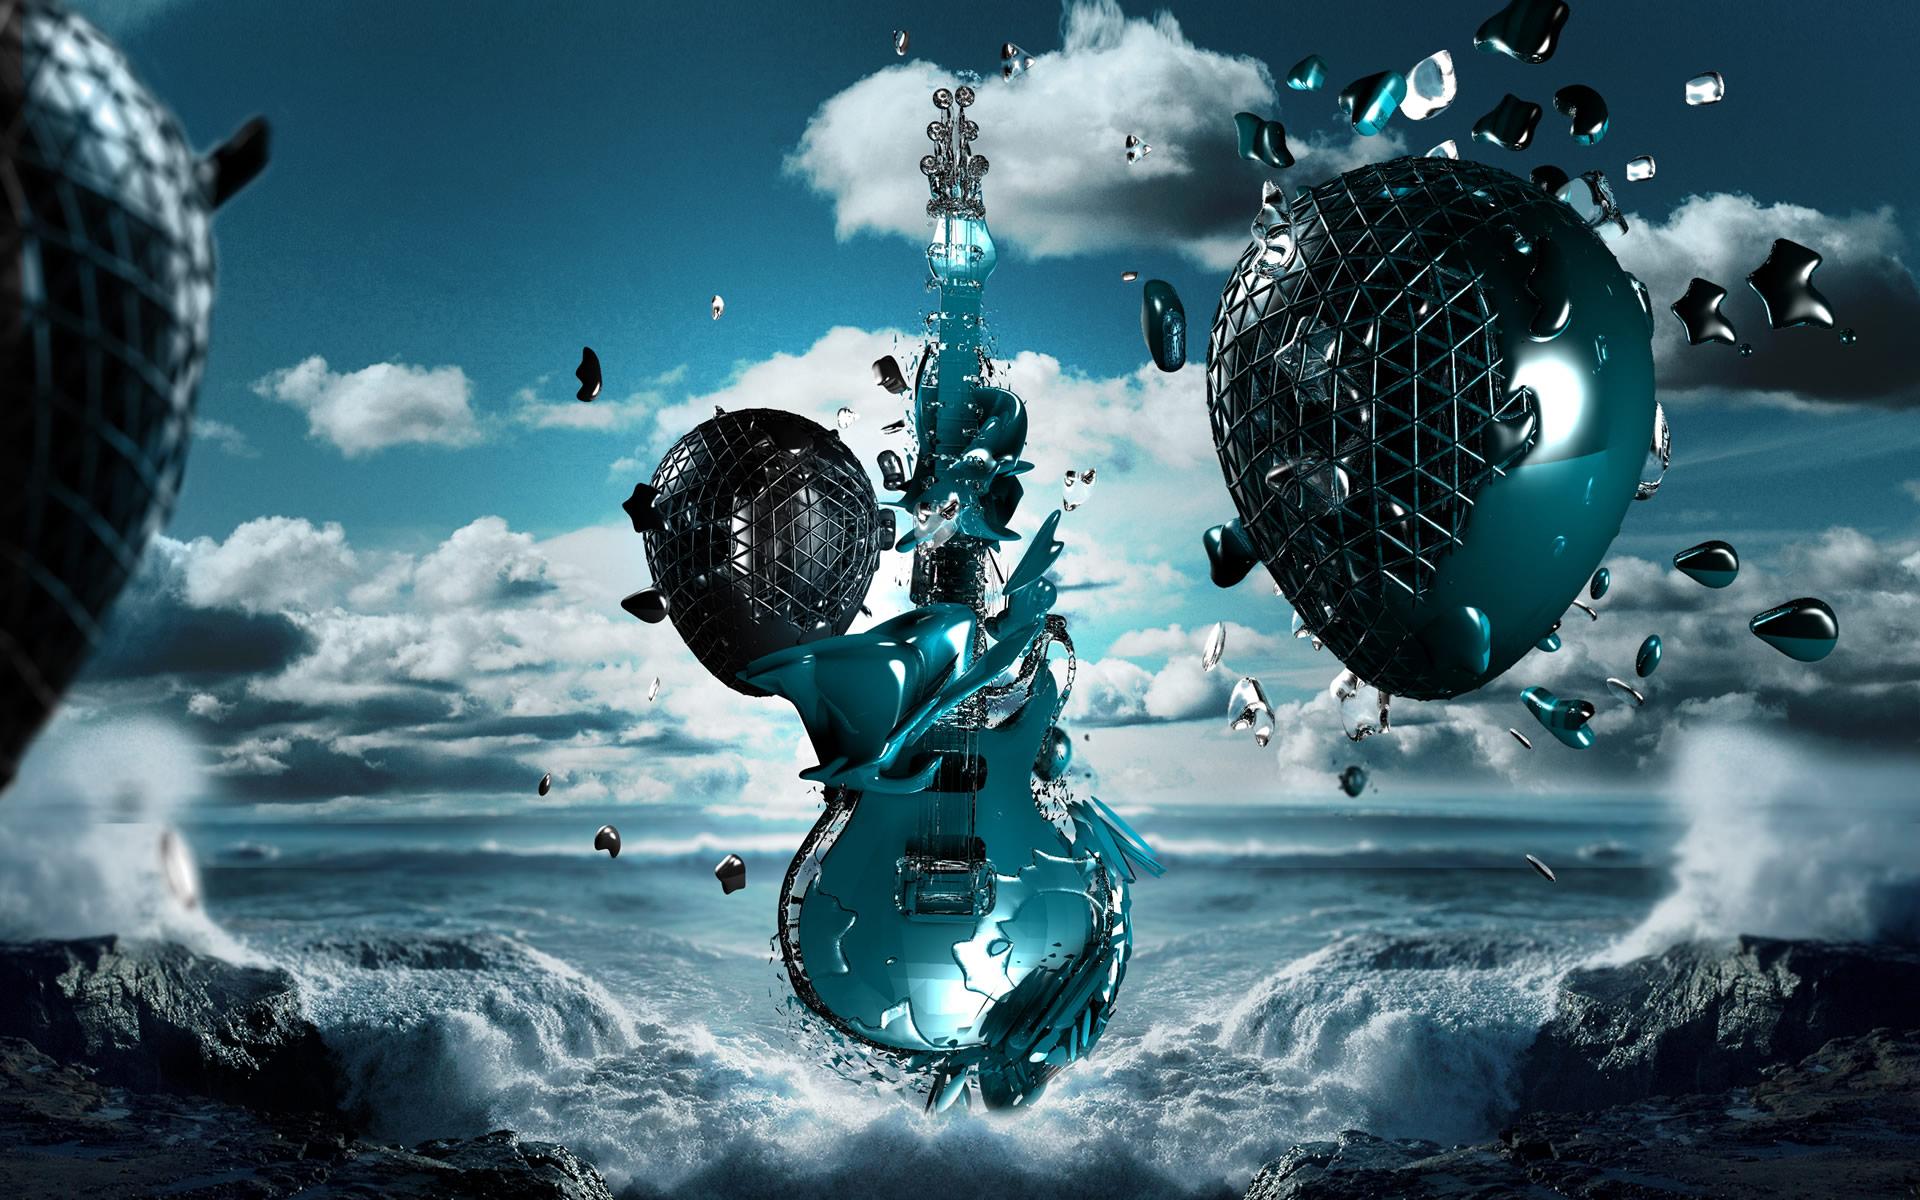 3d Creative Guitar Desktop Wallpaper   HD Wallpapers 1920x1200